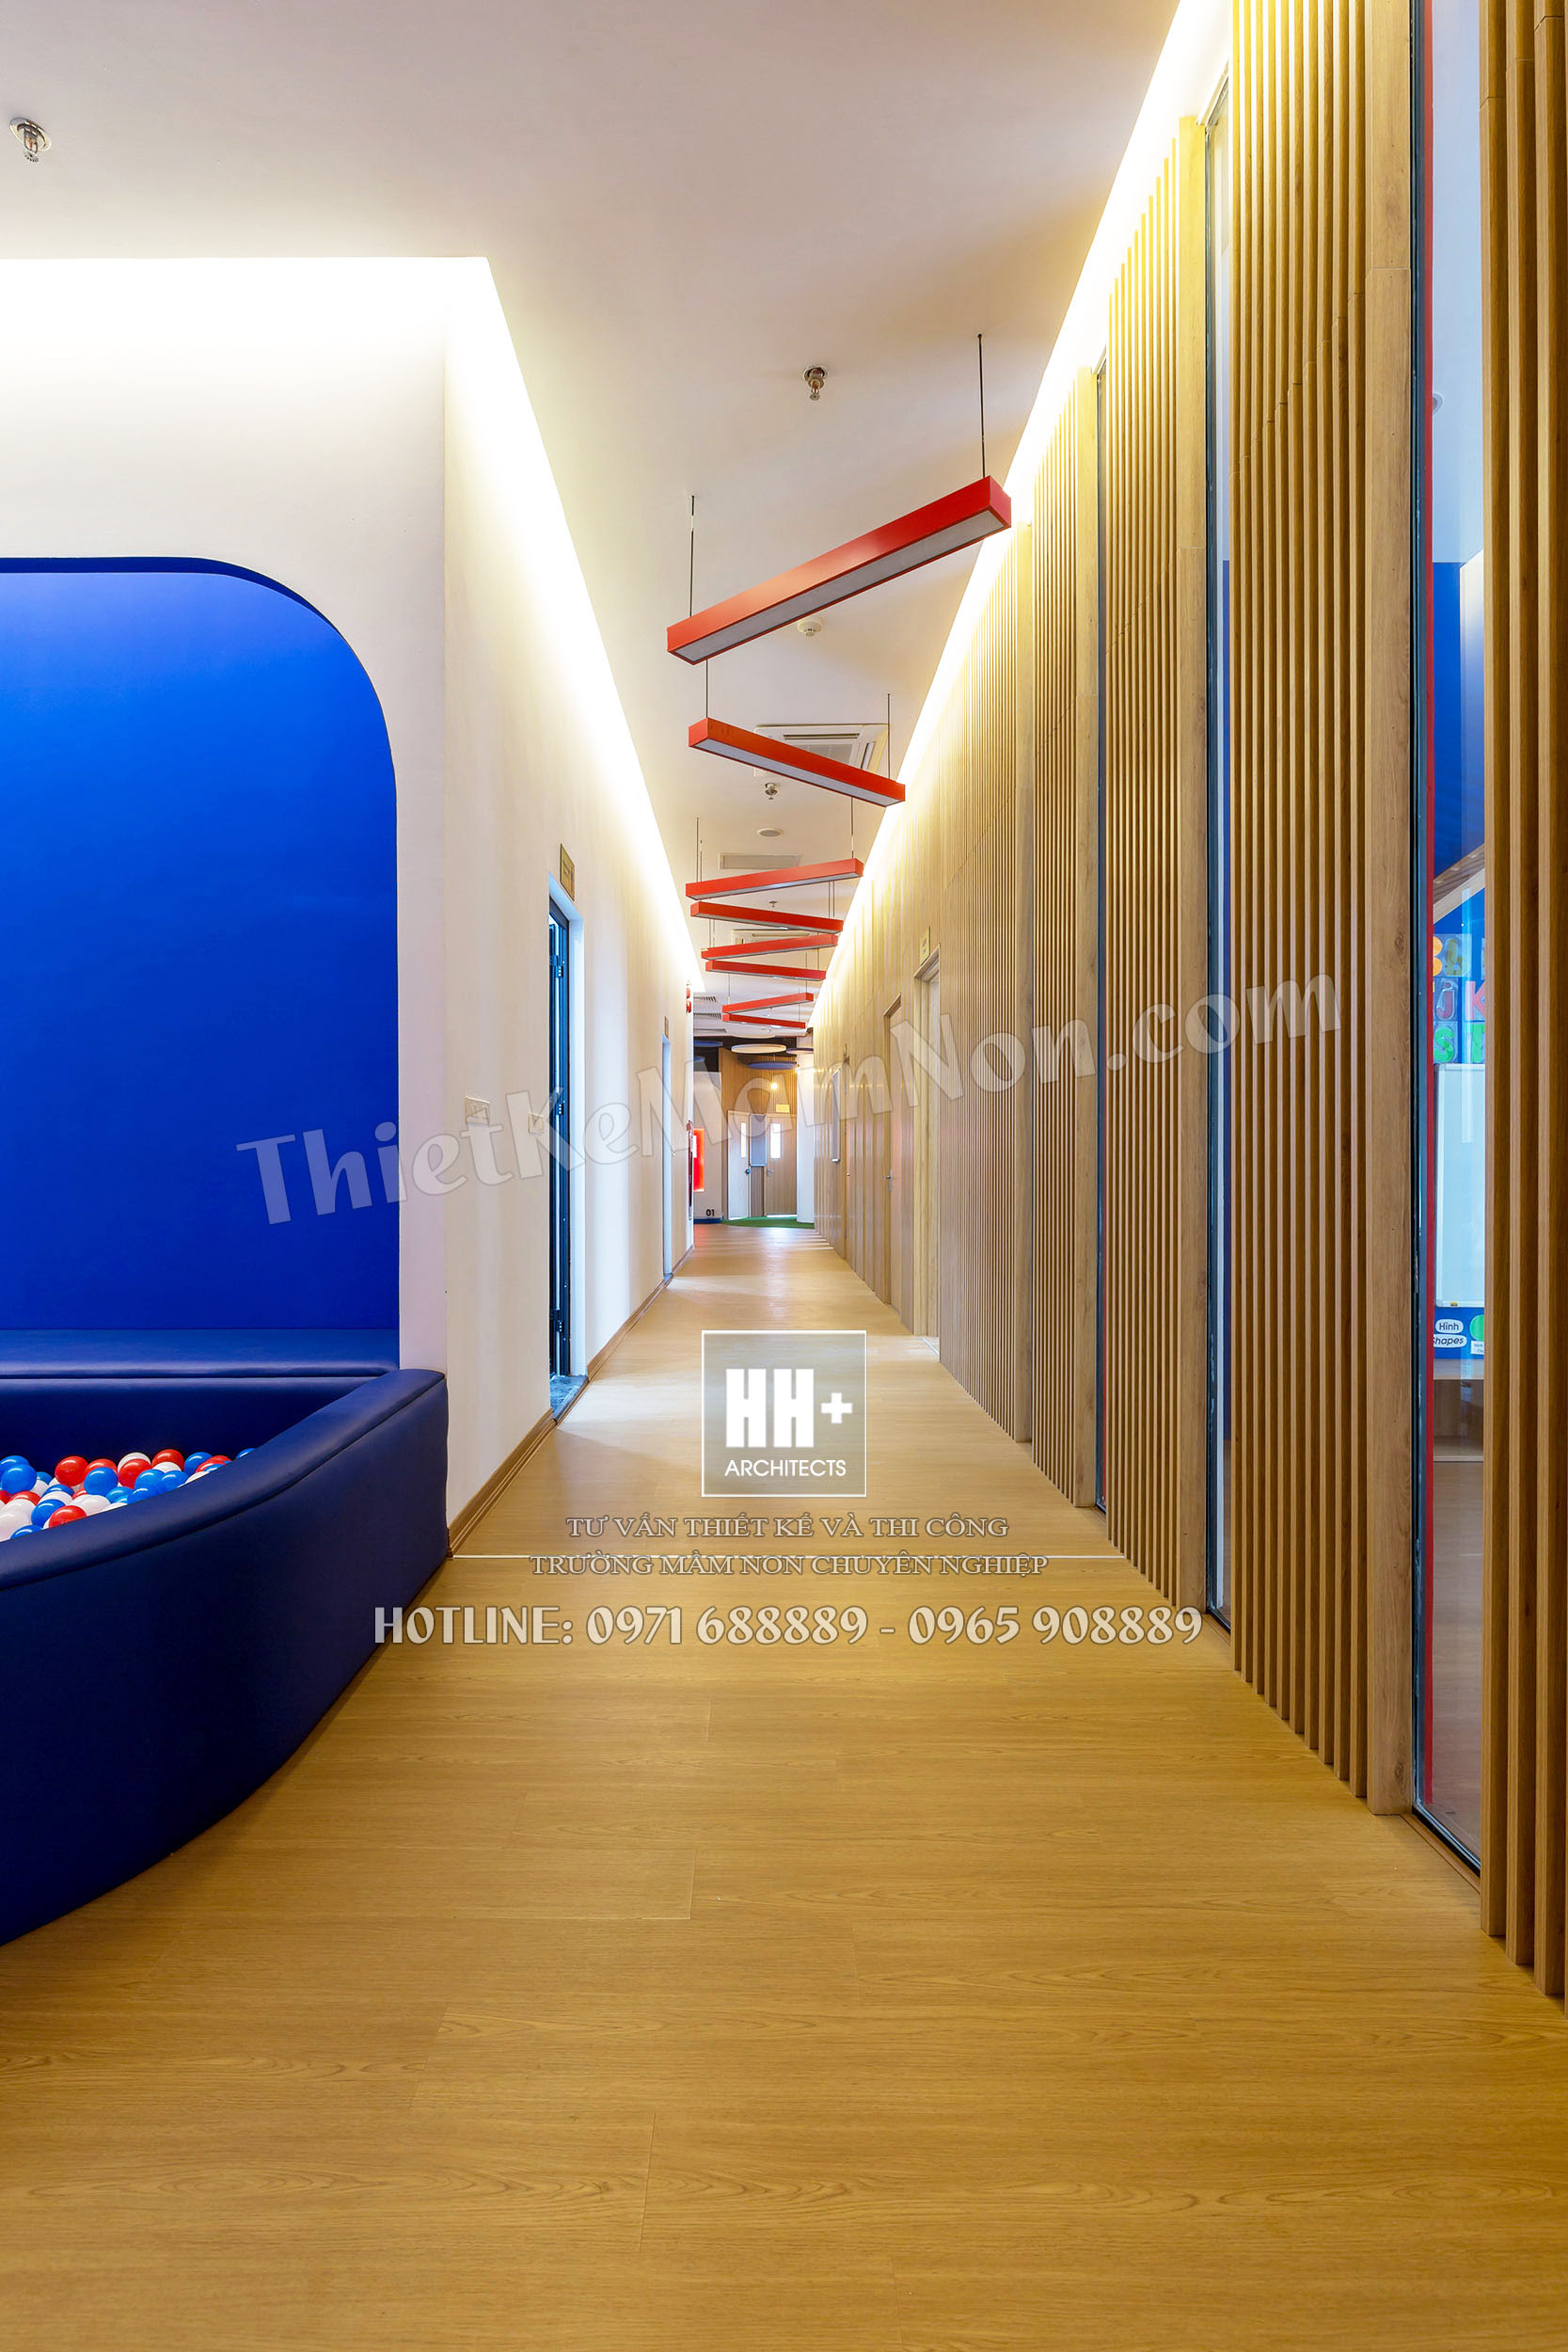 Rosemont_hanhlang_01 thiết kế trường mầm non Thiết kế trường mầm non Quốc Tế MỸ ROSEMONT Rosemont hanhlang 01